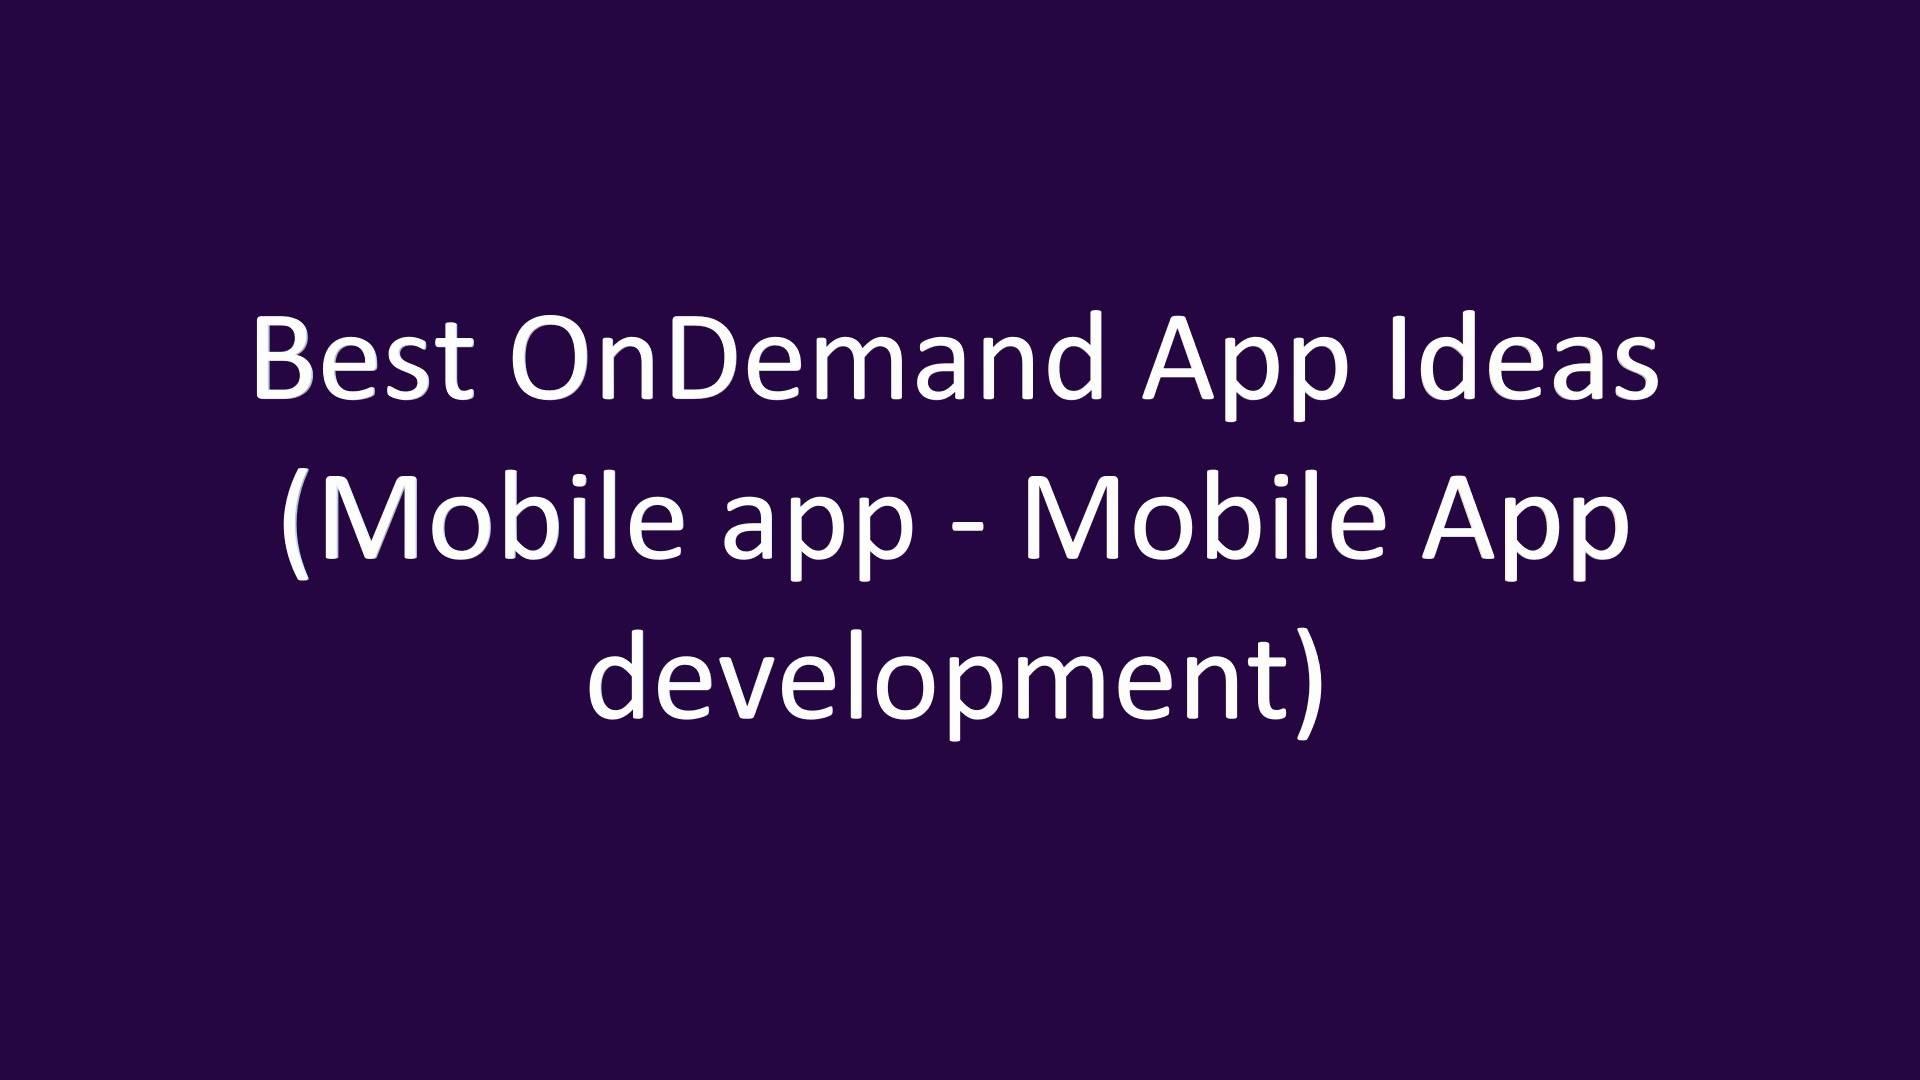 Best OnDemand App Ideas (Mobile app - Mobile App development)